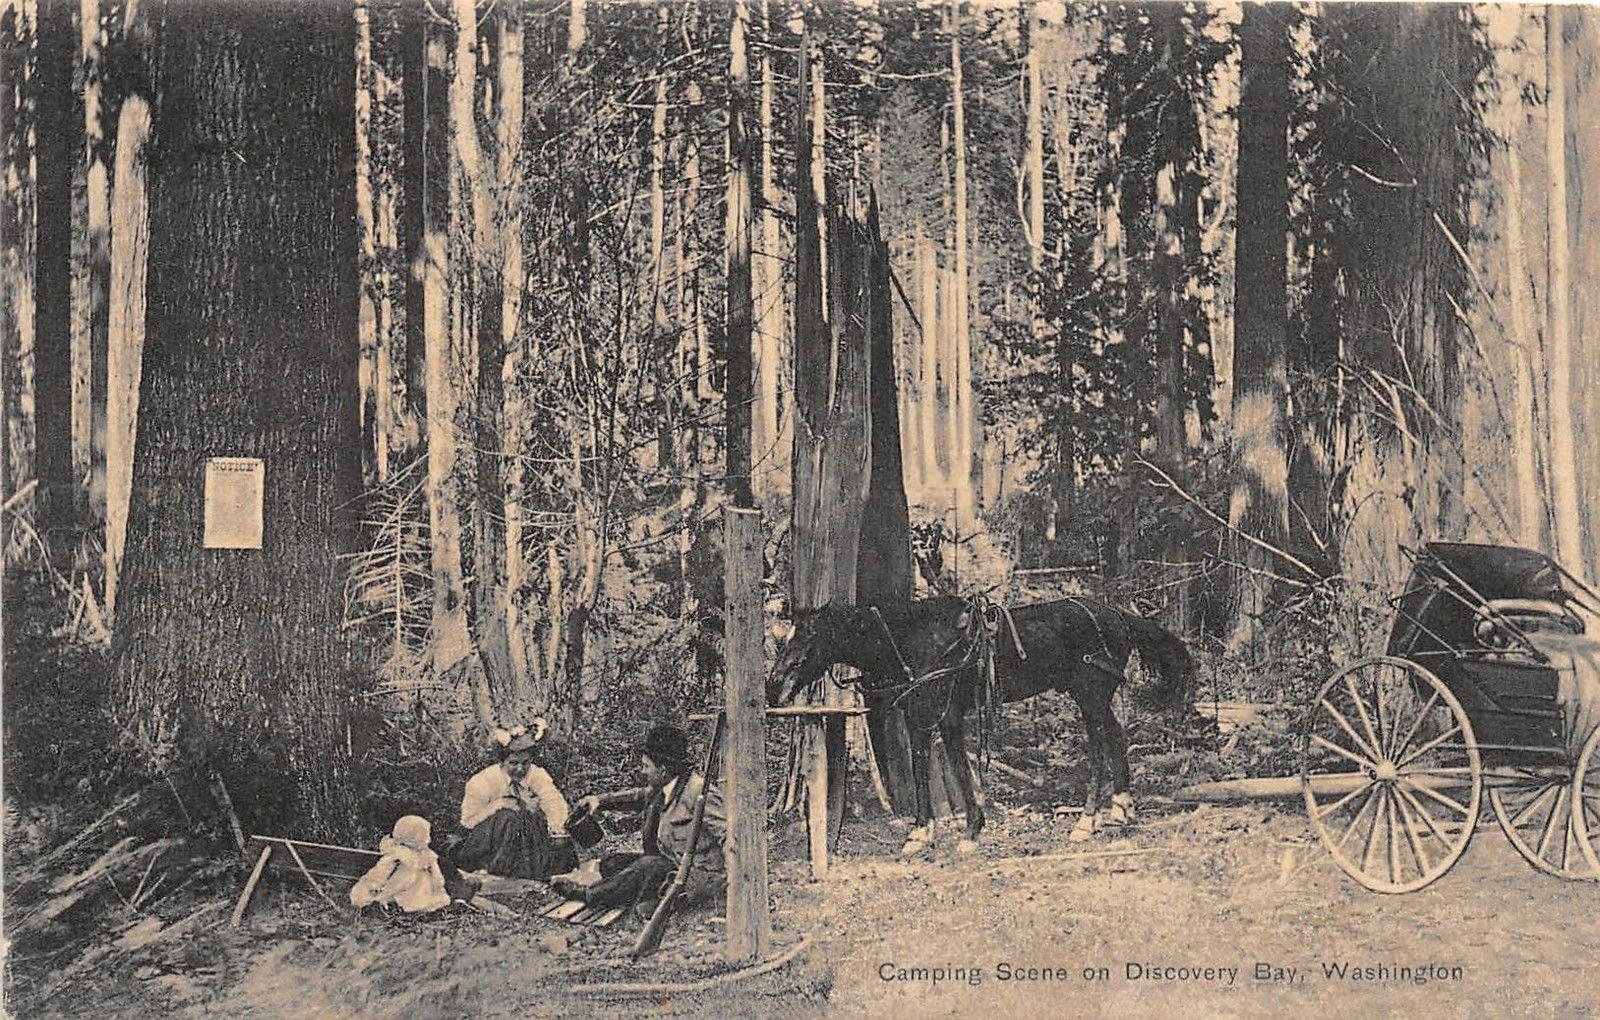 C19 Discovery Bay Washington Wa Postcard C1910 Camping Scene Family Horse Hippostcard